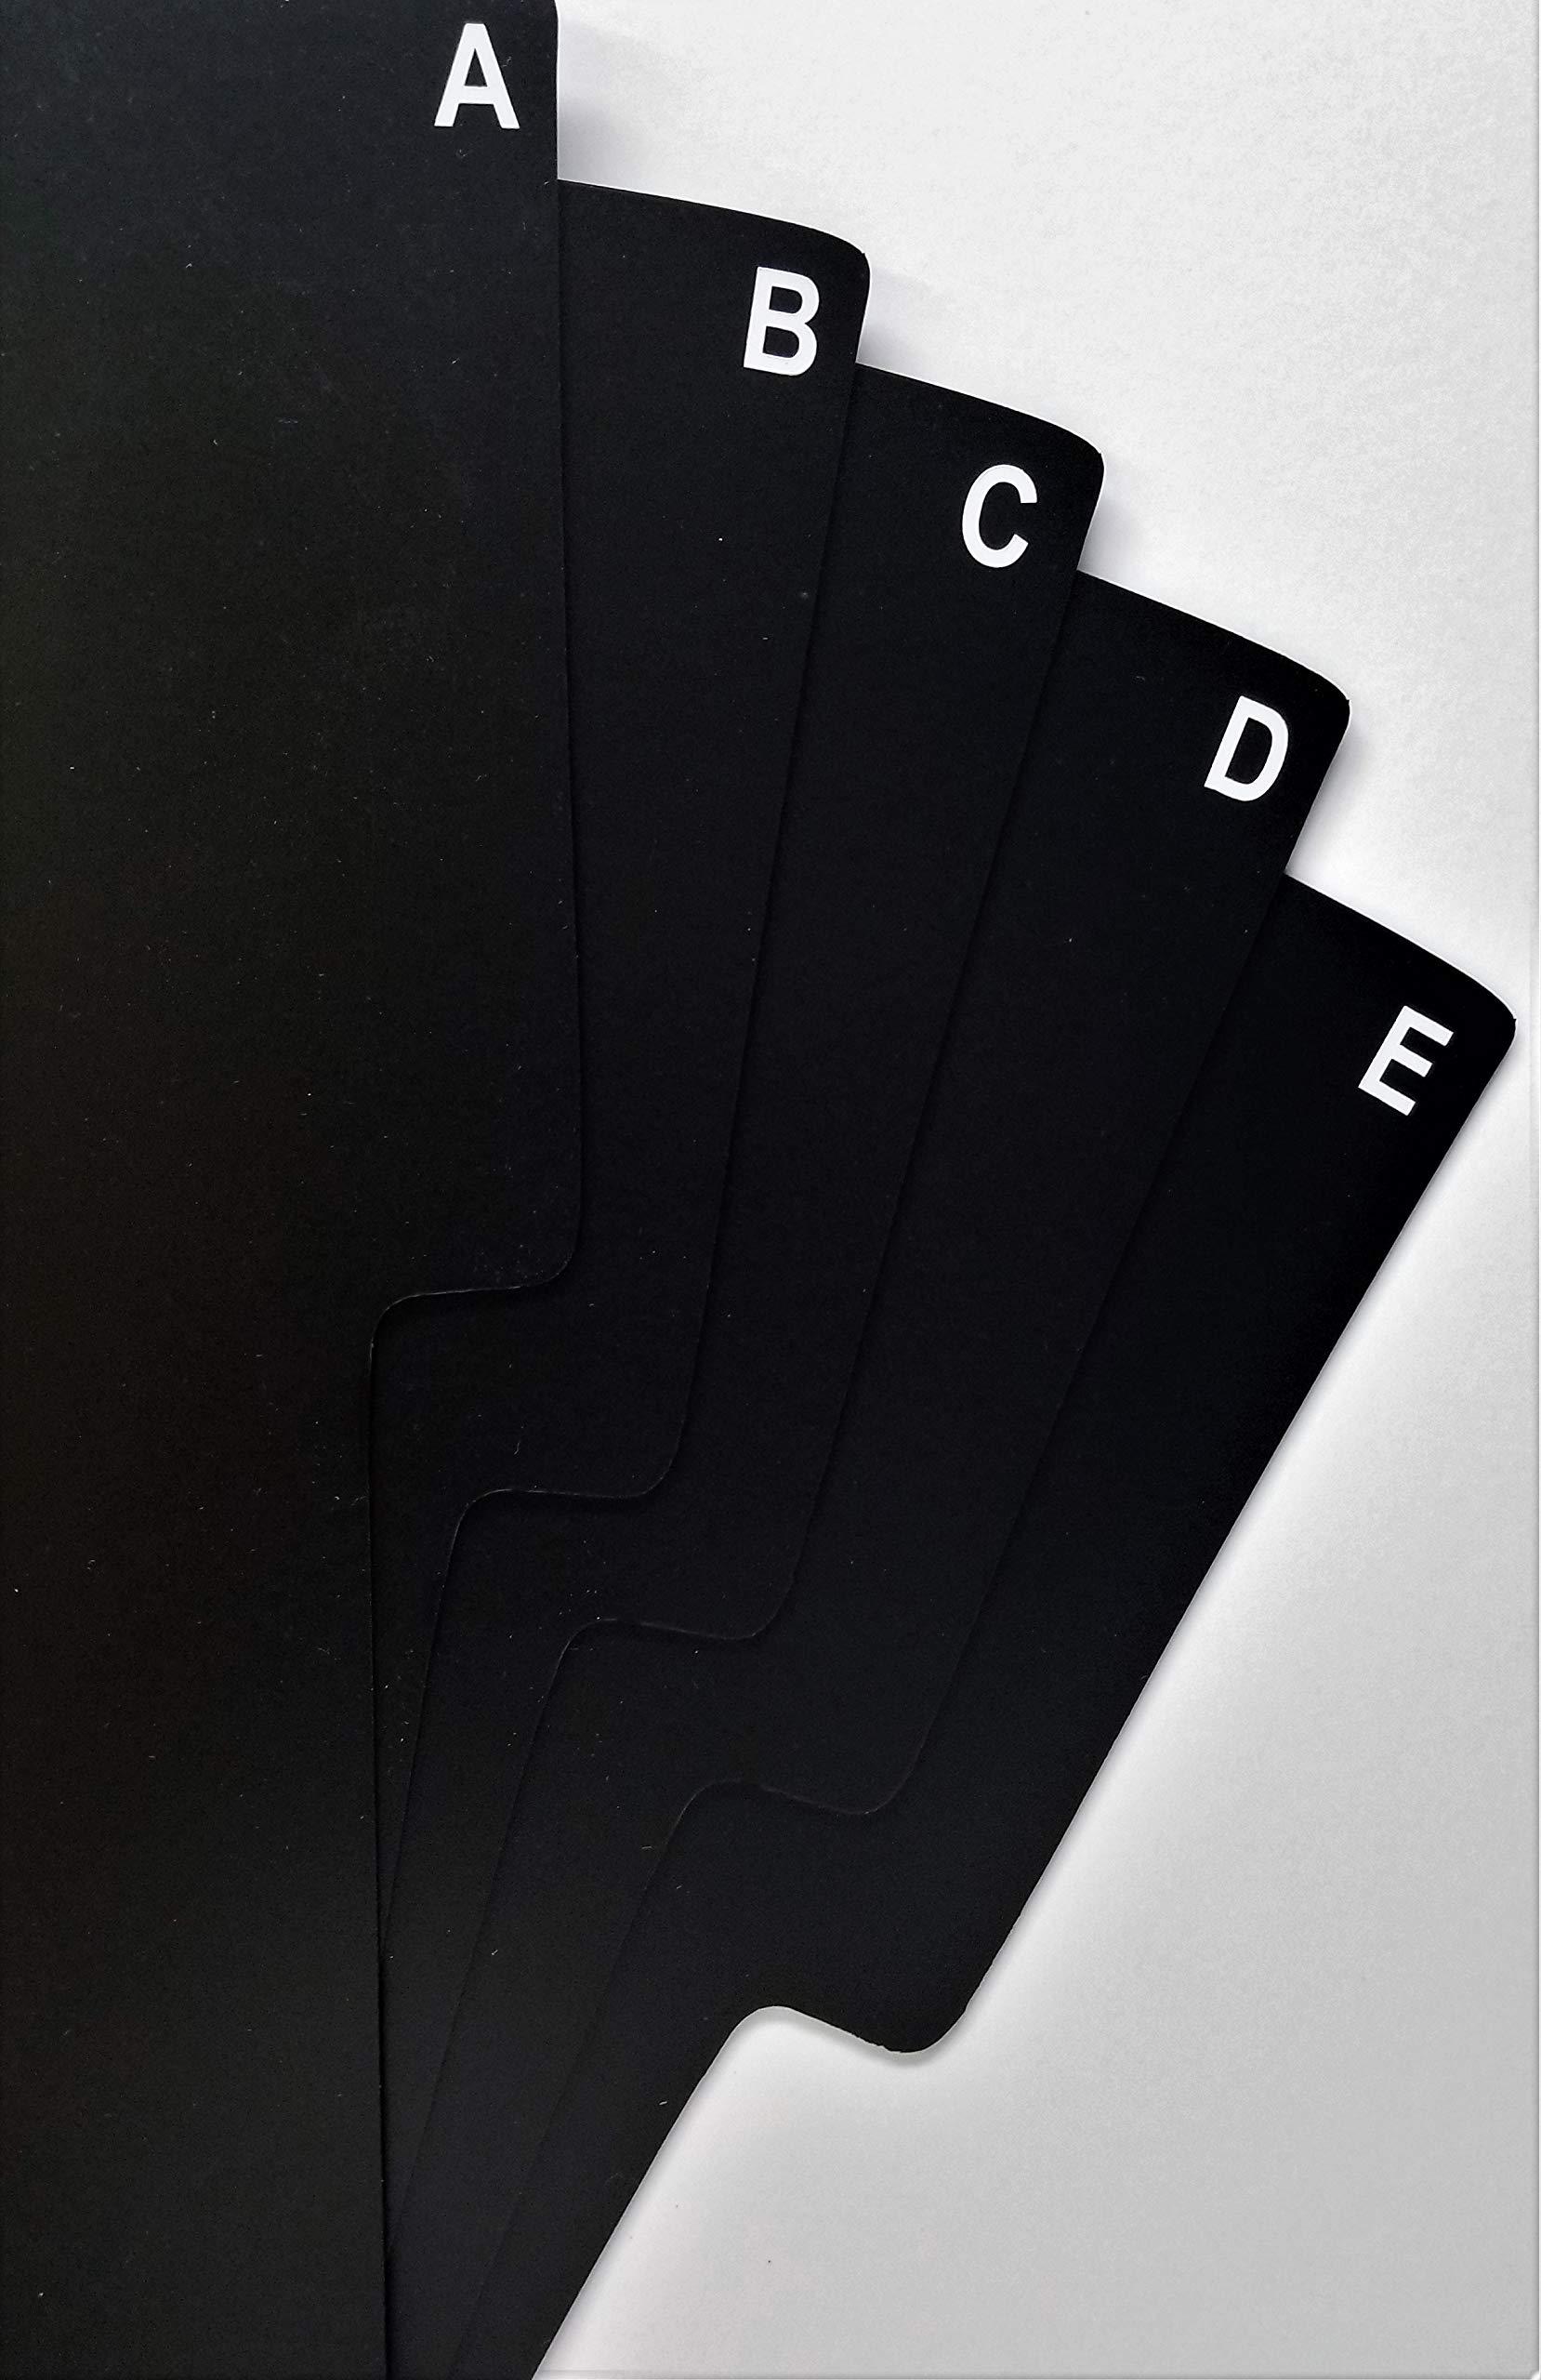 A-Z Shelf Divider Cards Custom Black 32pc for LP Vinyl Record Albums +Bonus ~ IKEA kallax expedit by Sleevie Wonder